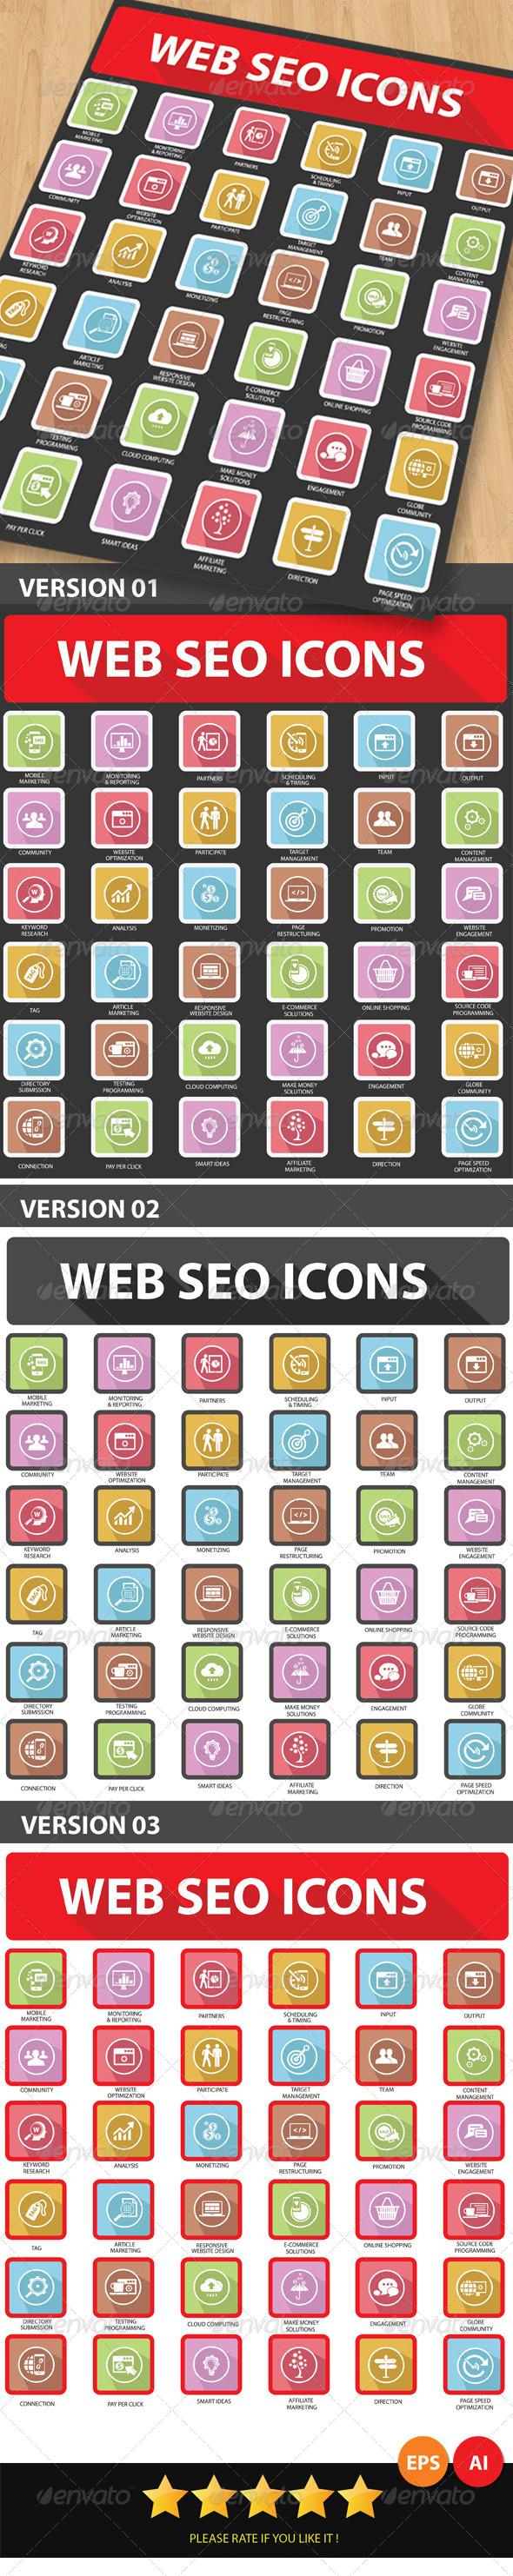 GraphicRiver Web SEO Icons 6365079